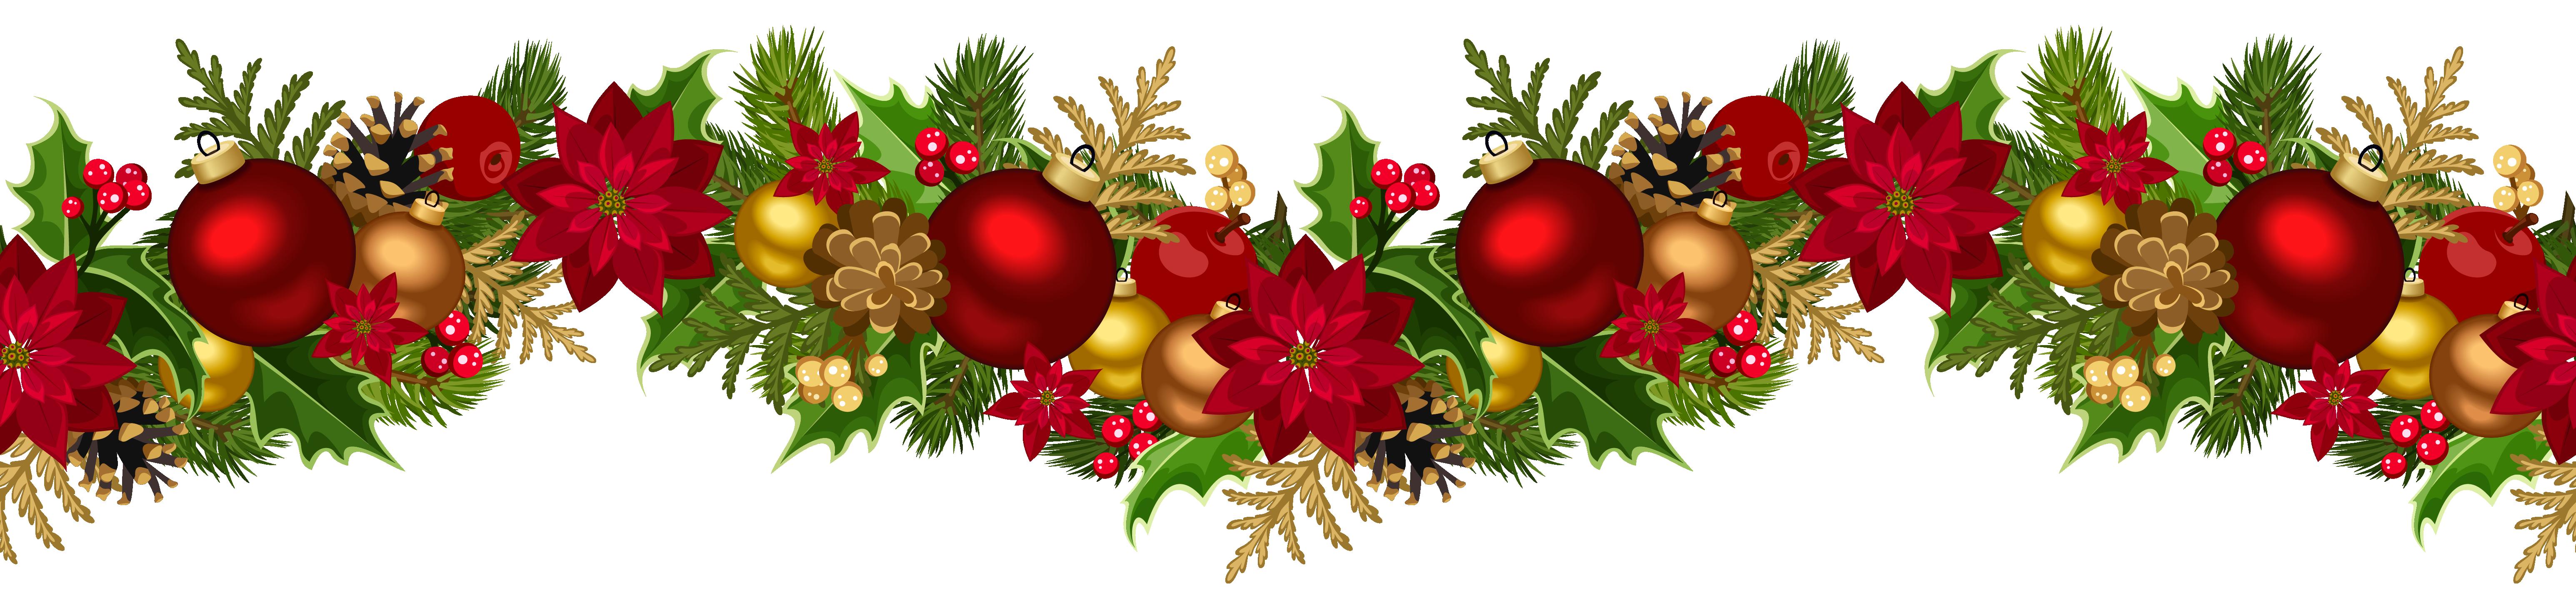 Christmas garland border png. Decorative clip art image